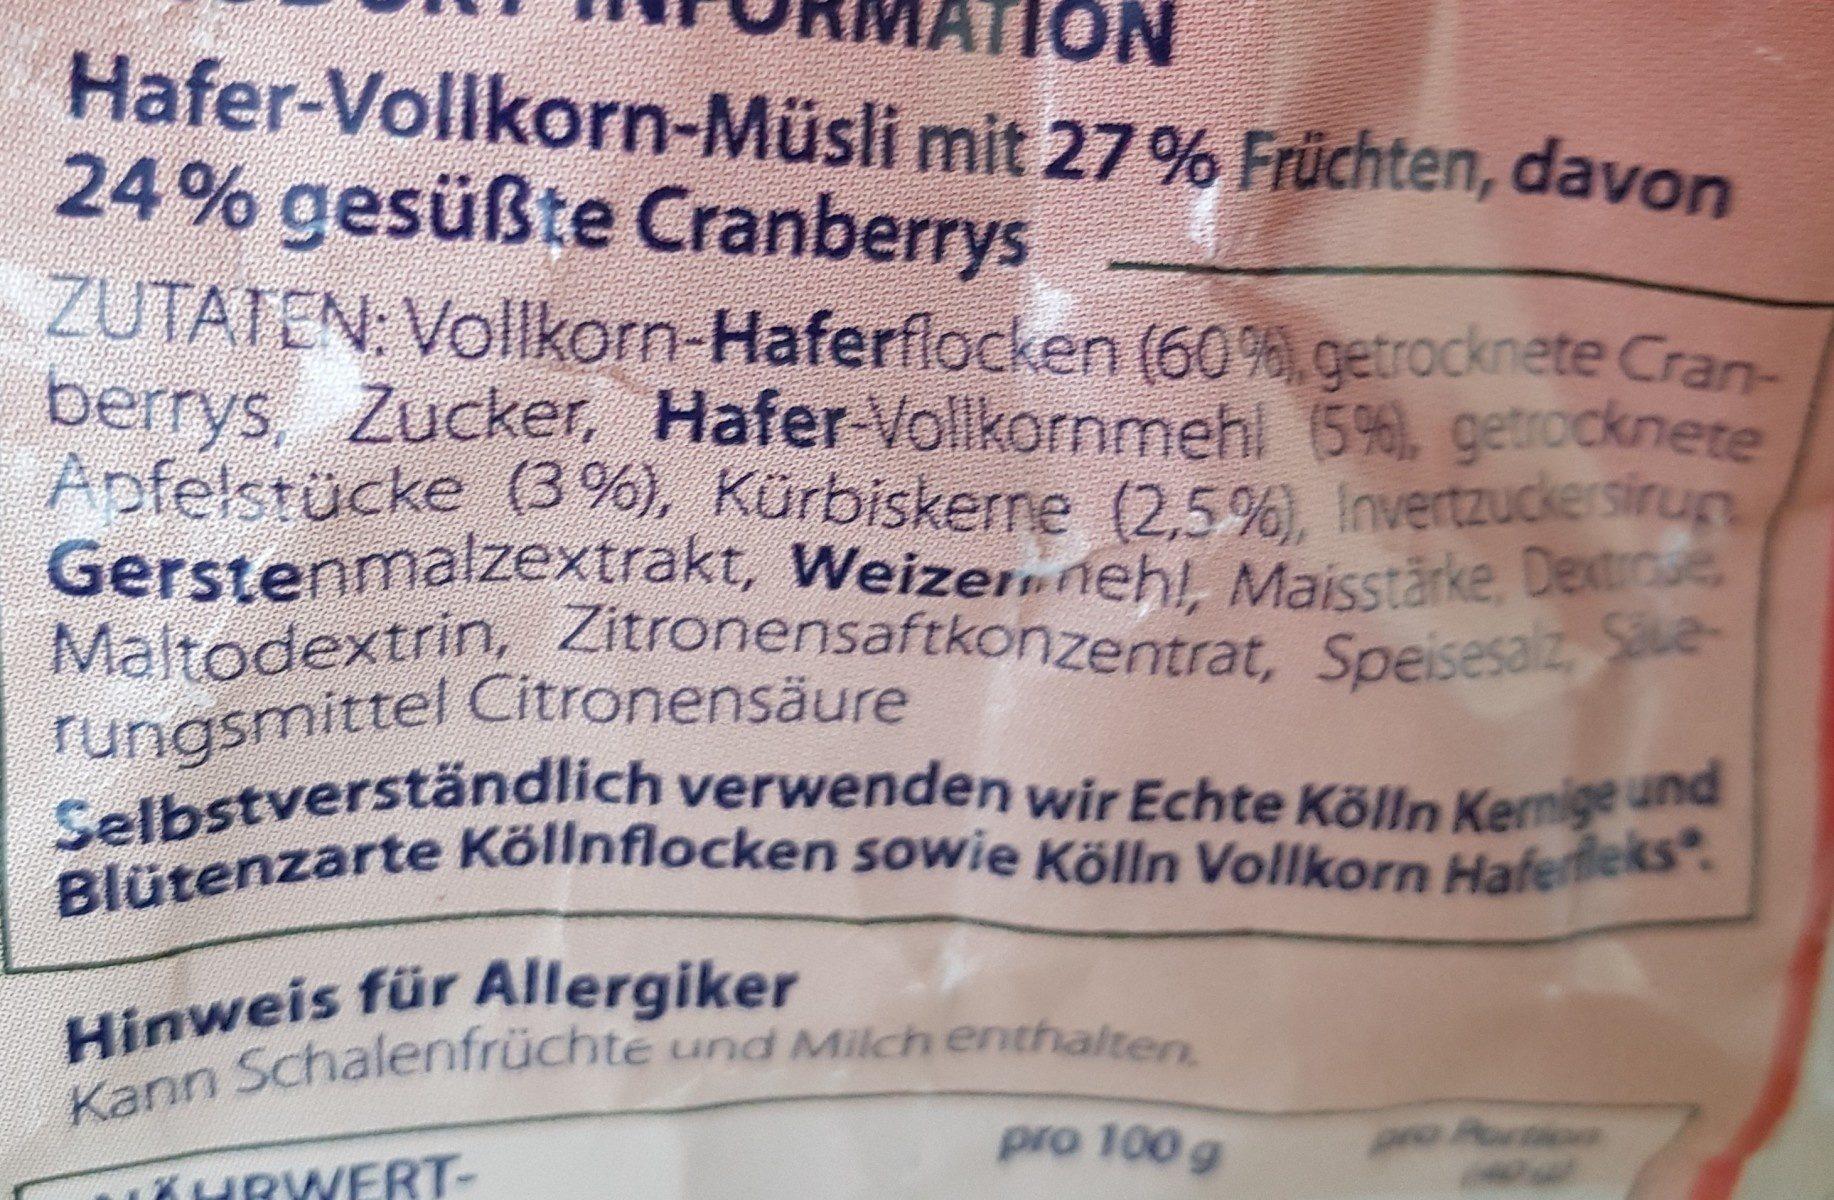 Musli cranberry - Ingredients - fr